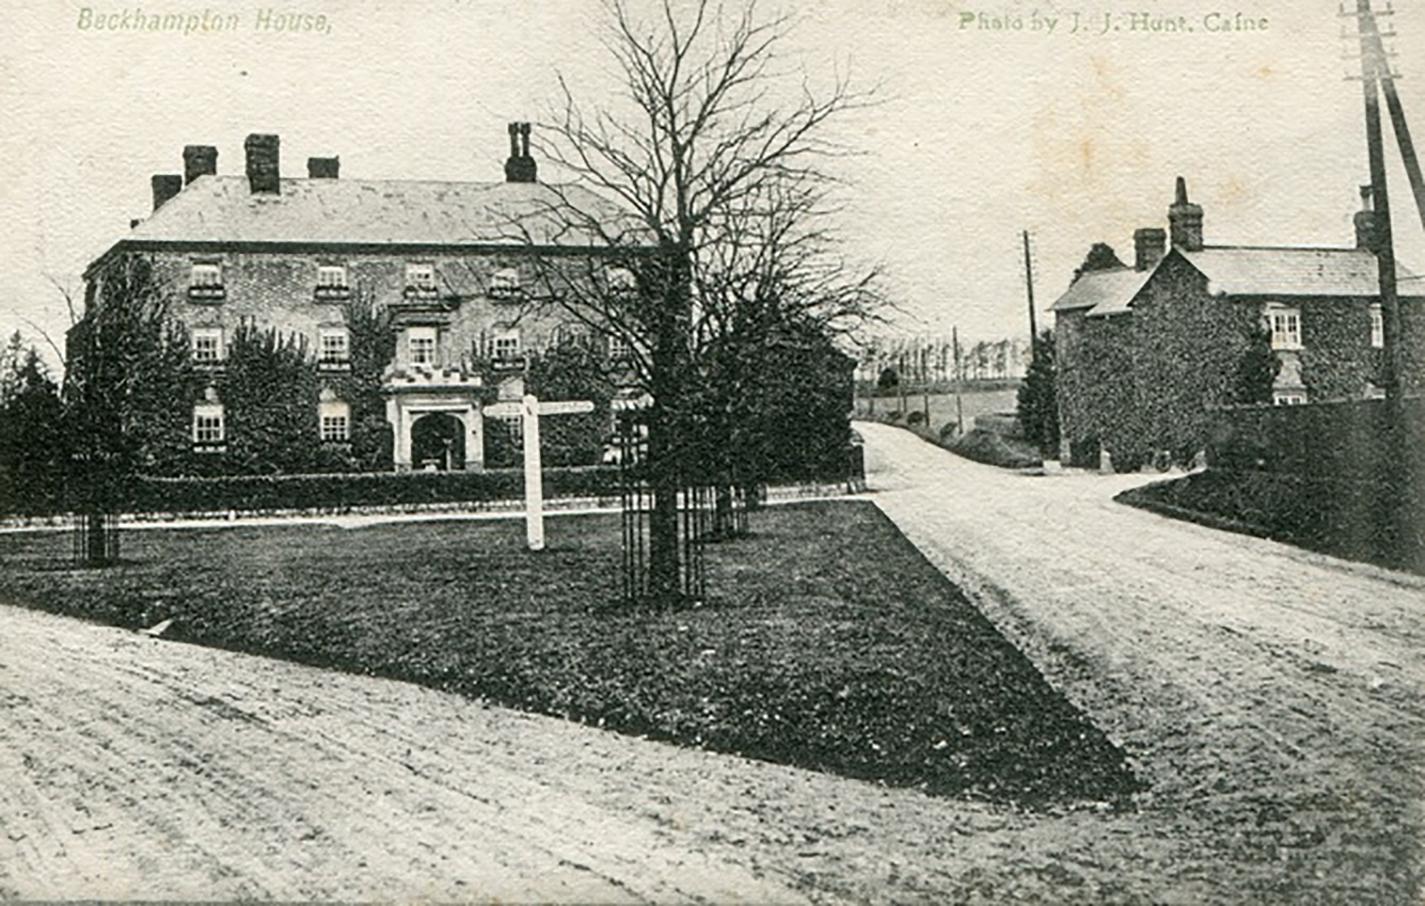 Beckhampton House